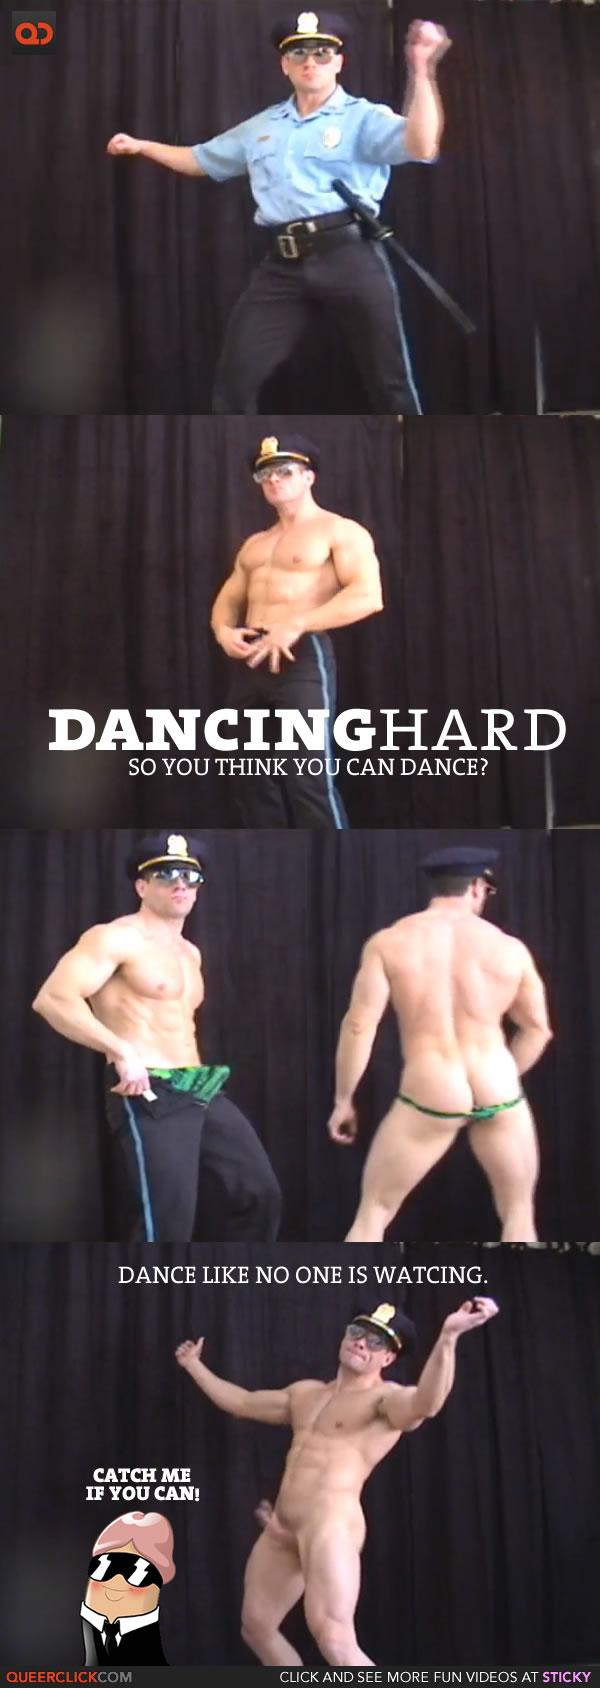 DancingHard policeman dance